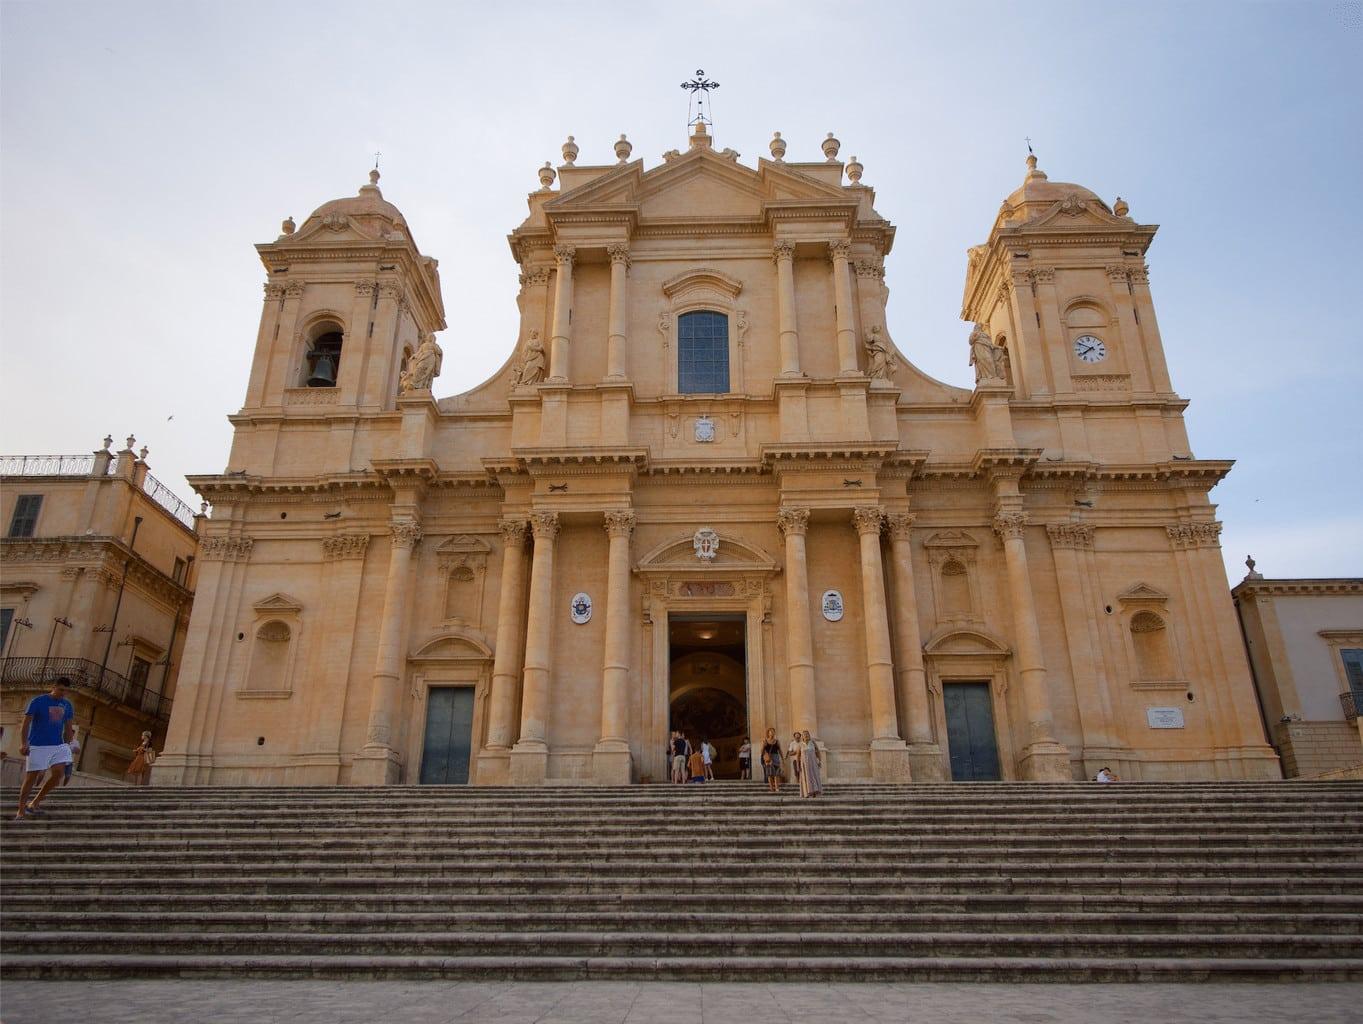 San Nicolo Cathedral